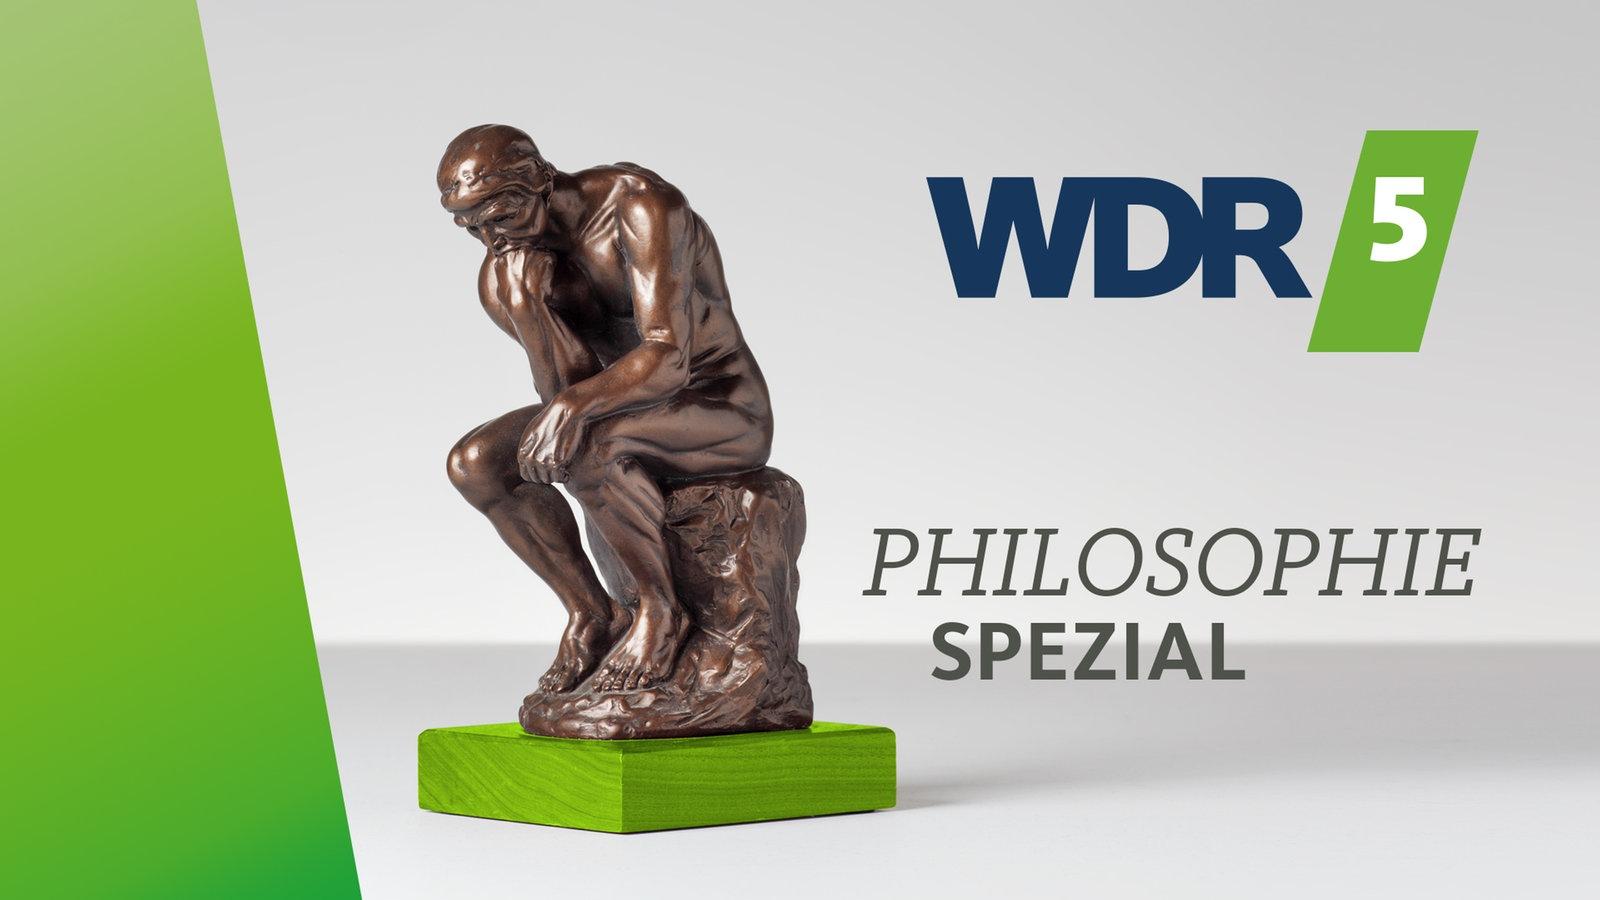 Wdr Philosophie